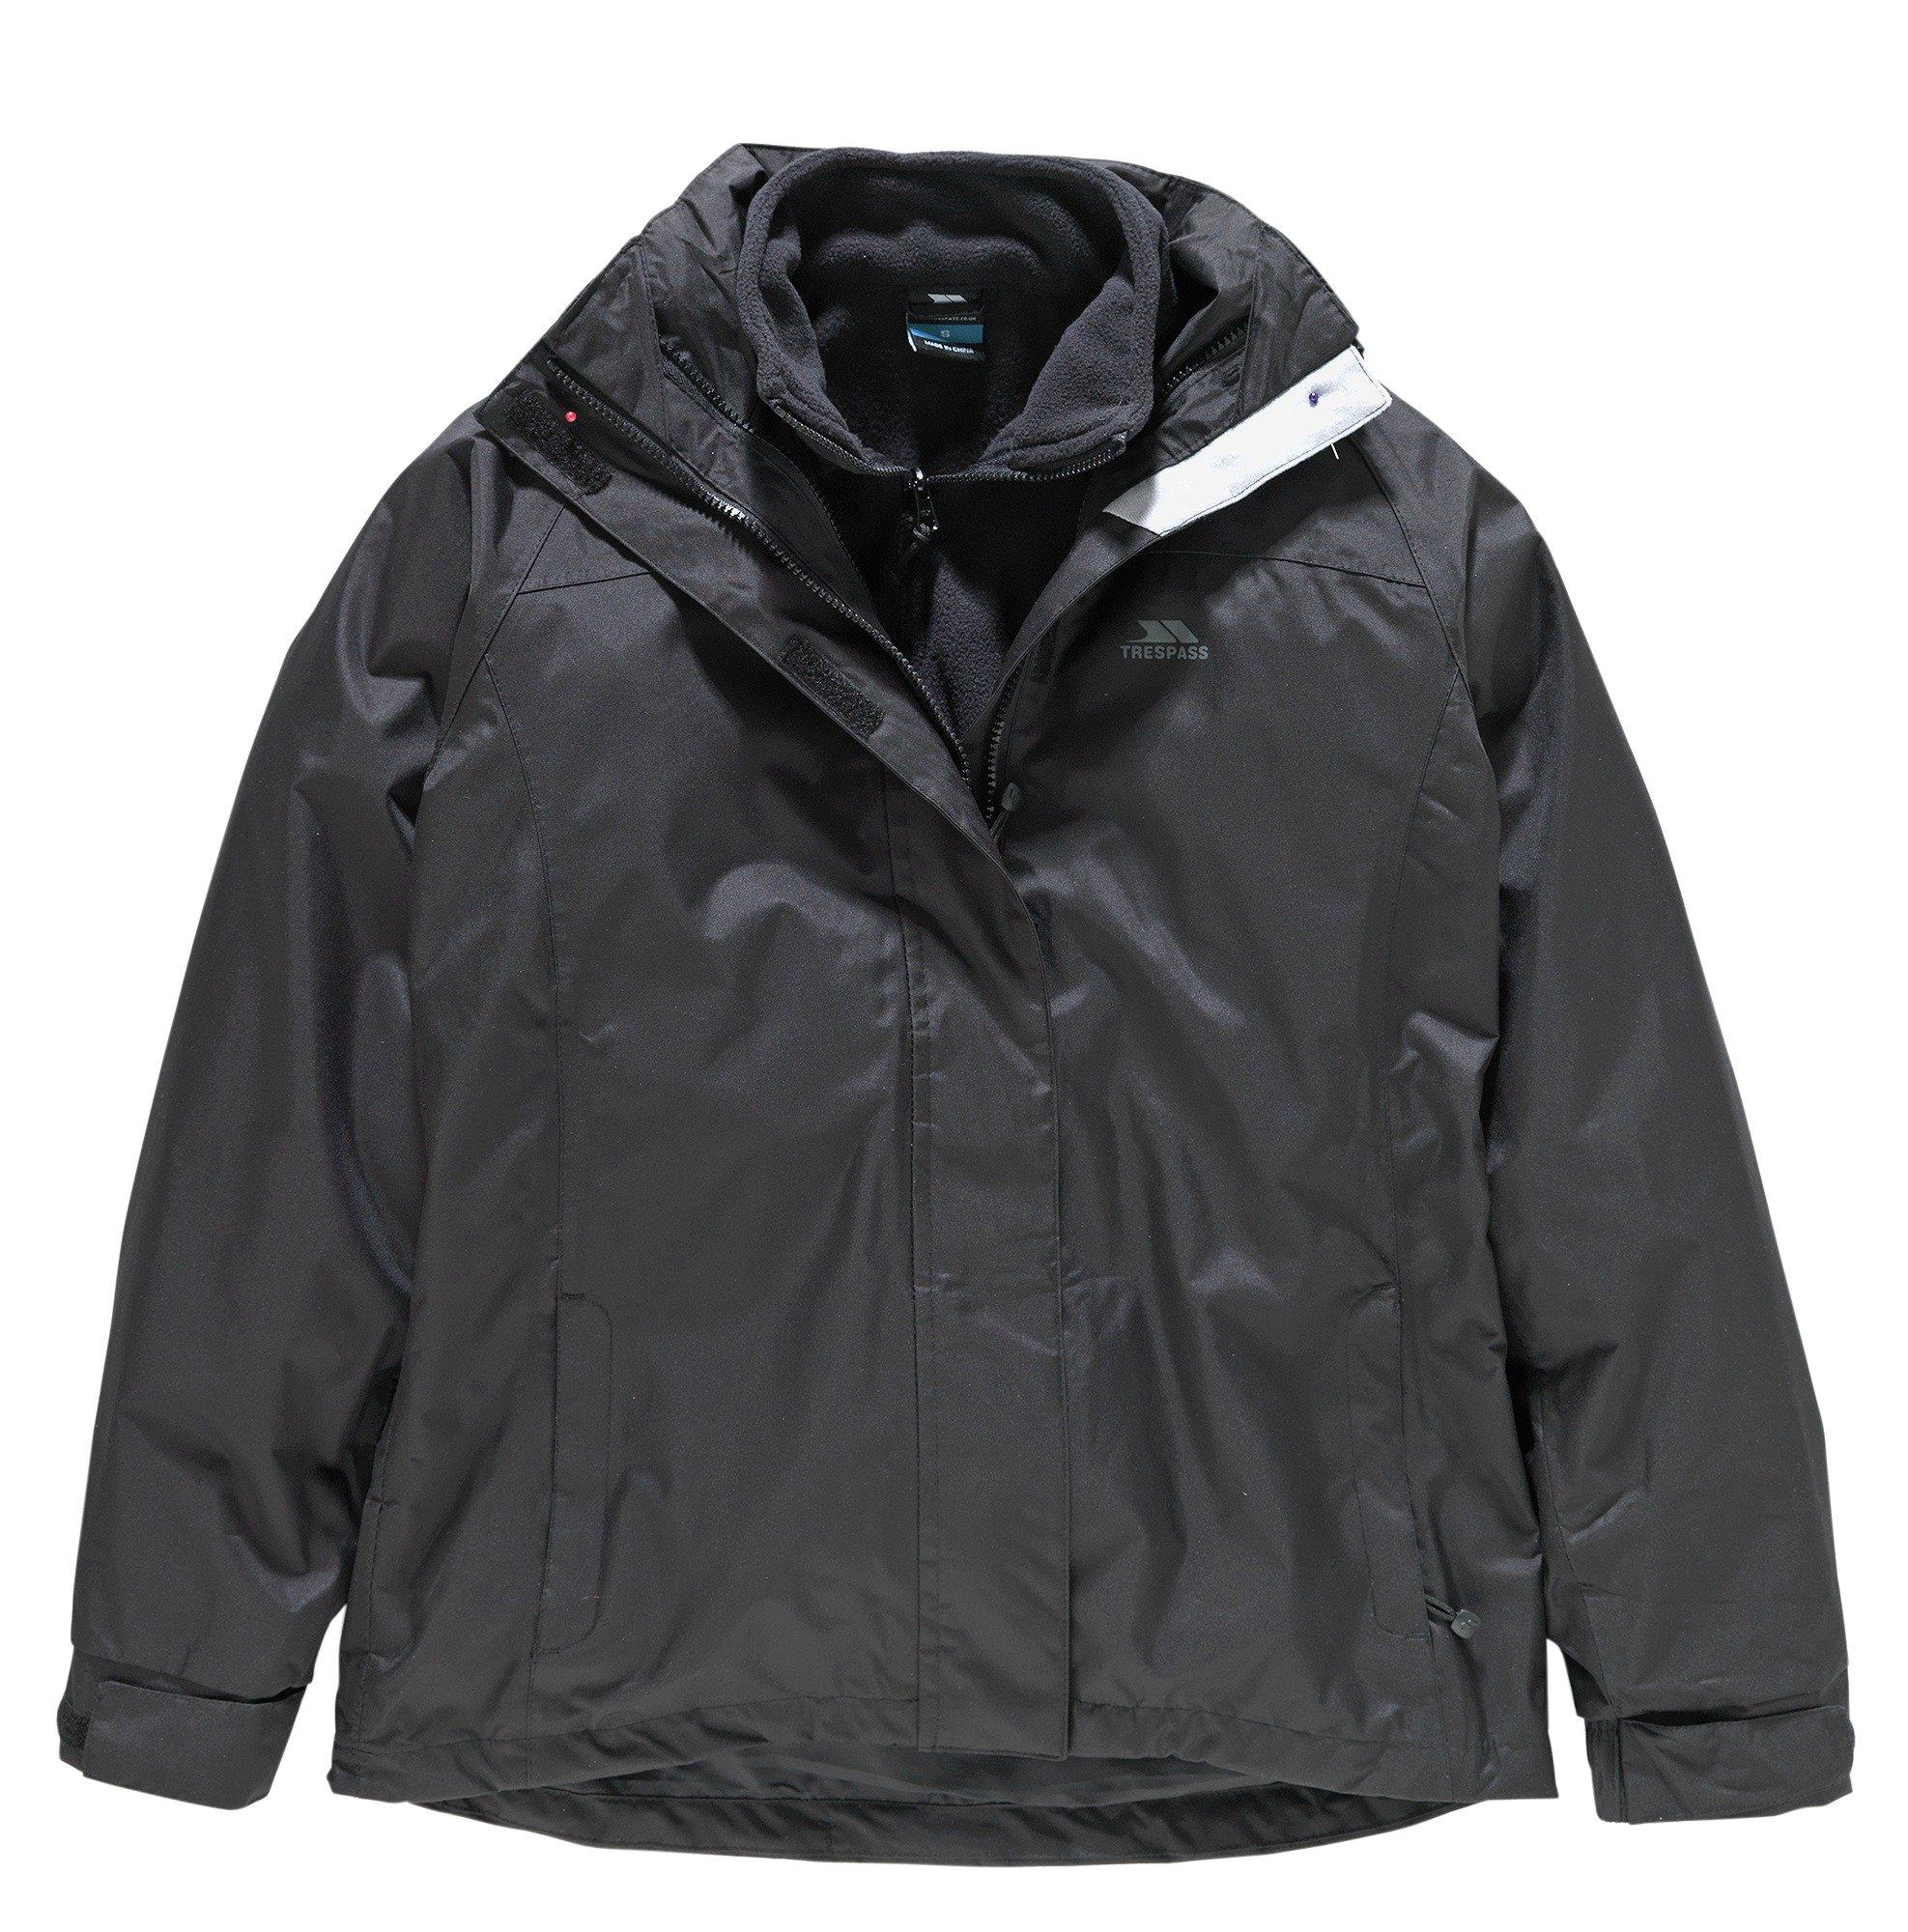 Image of Trespass Black 3 in 1 Jacket - Extra Large